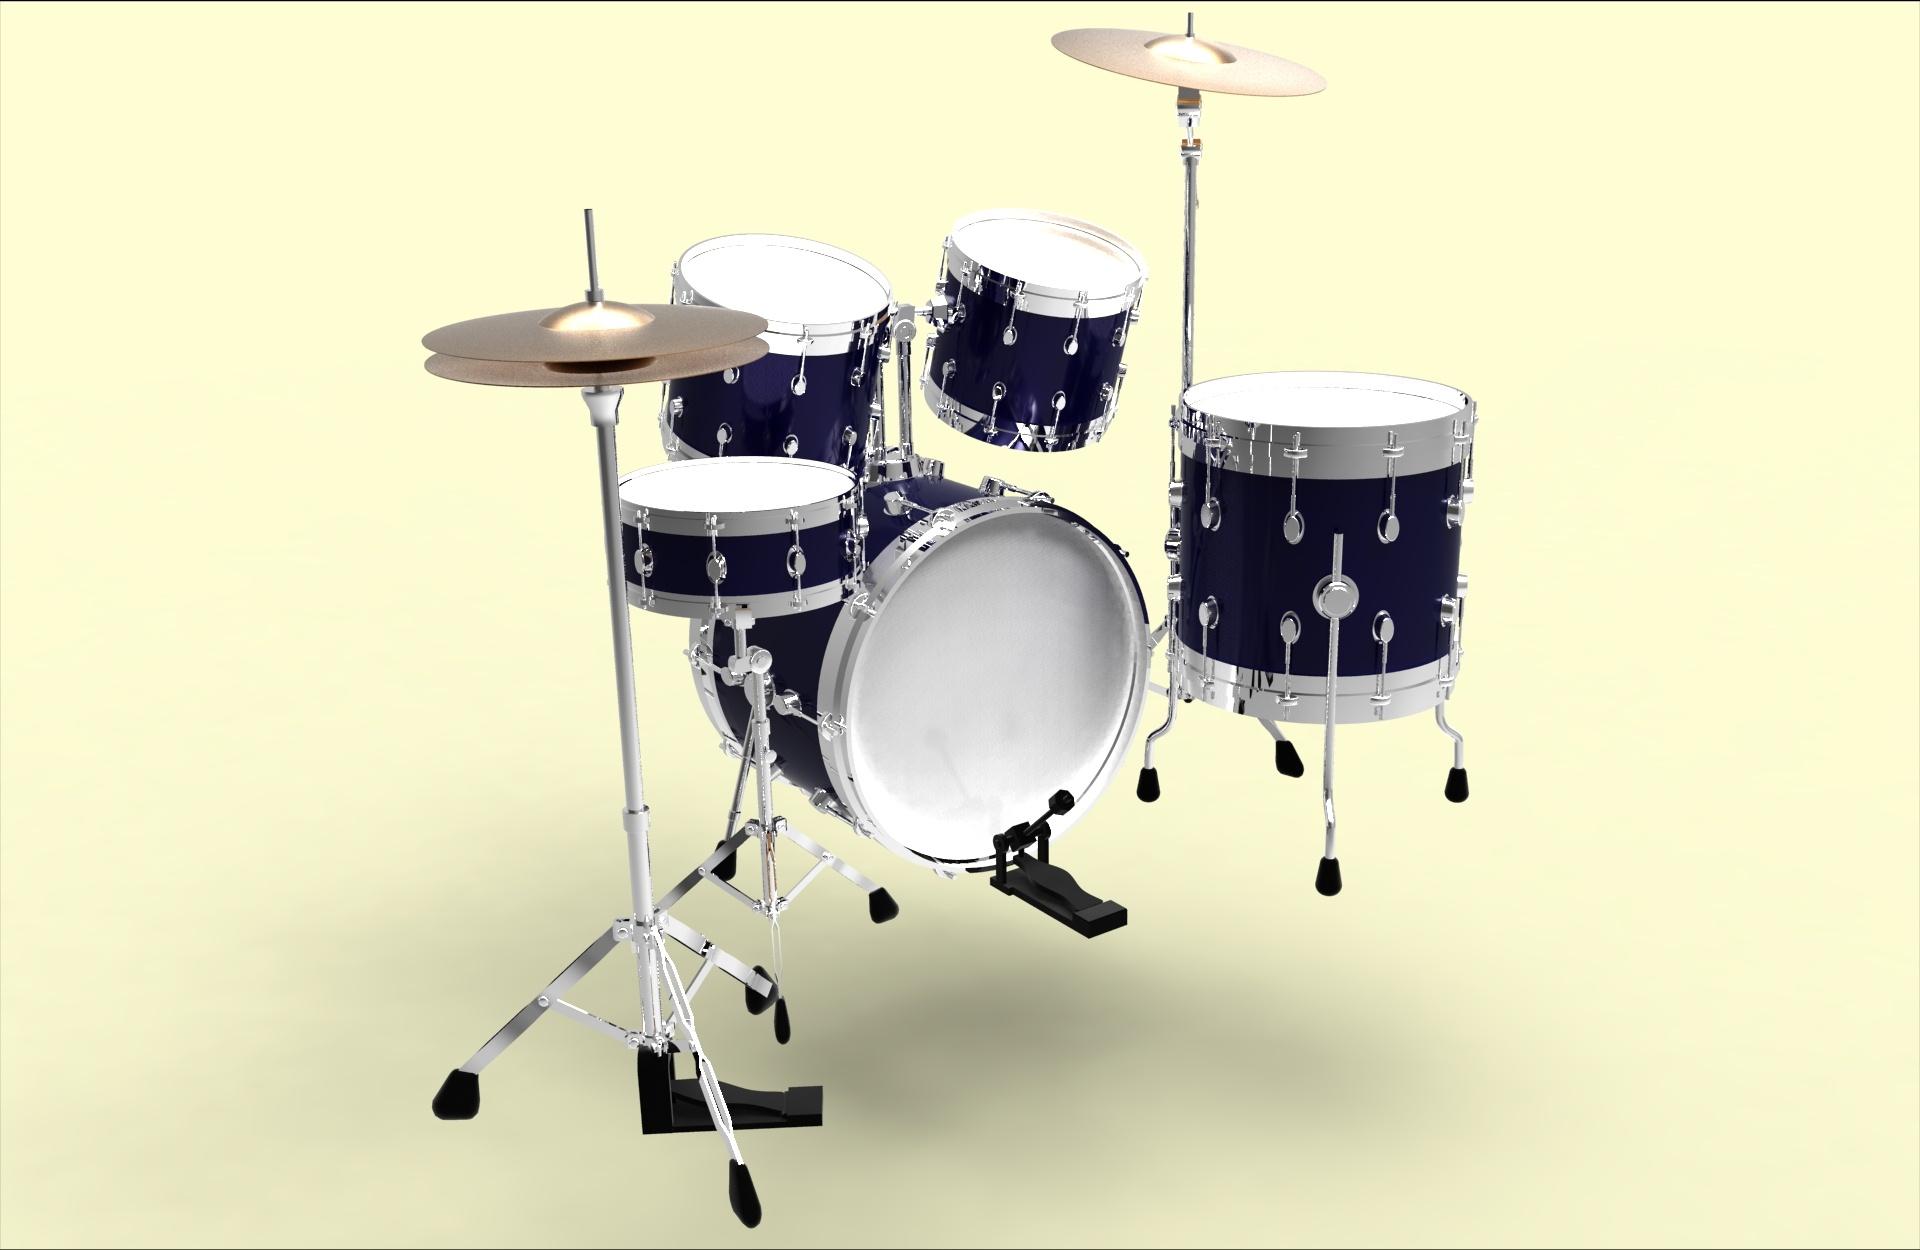 3d练习作品 架子鼓